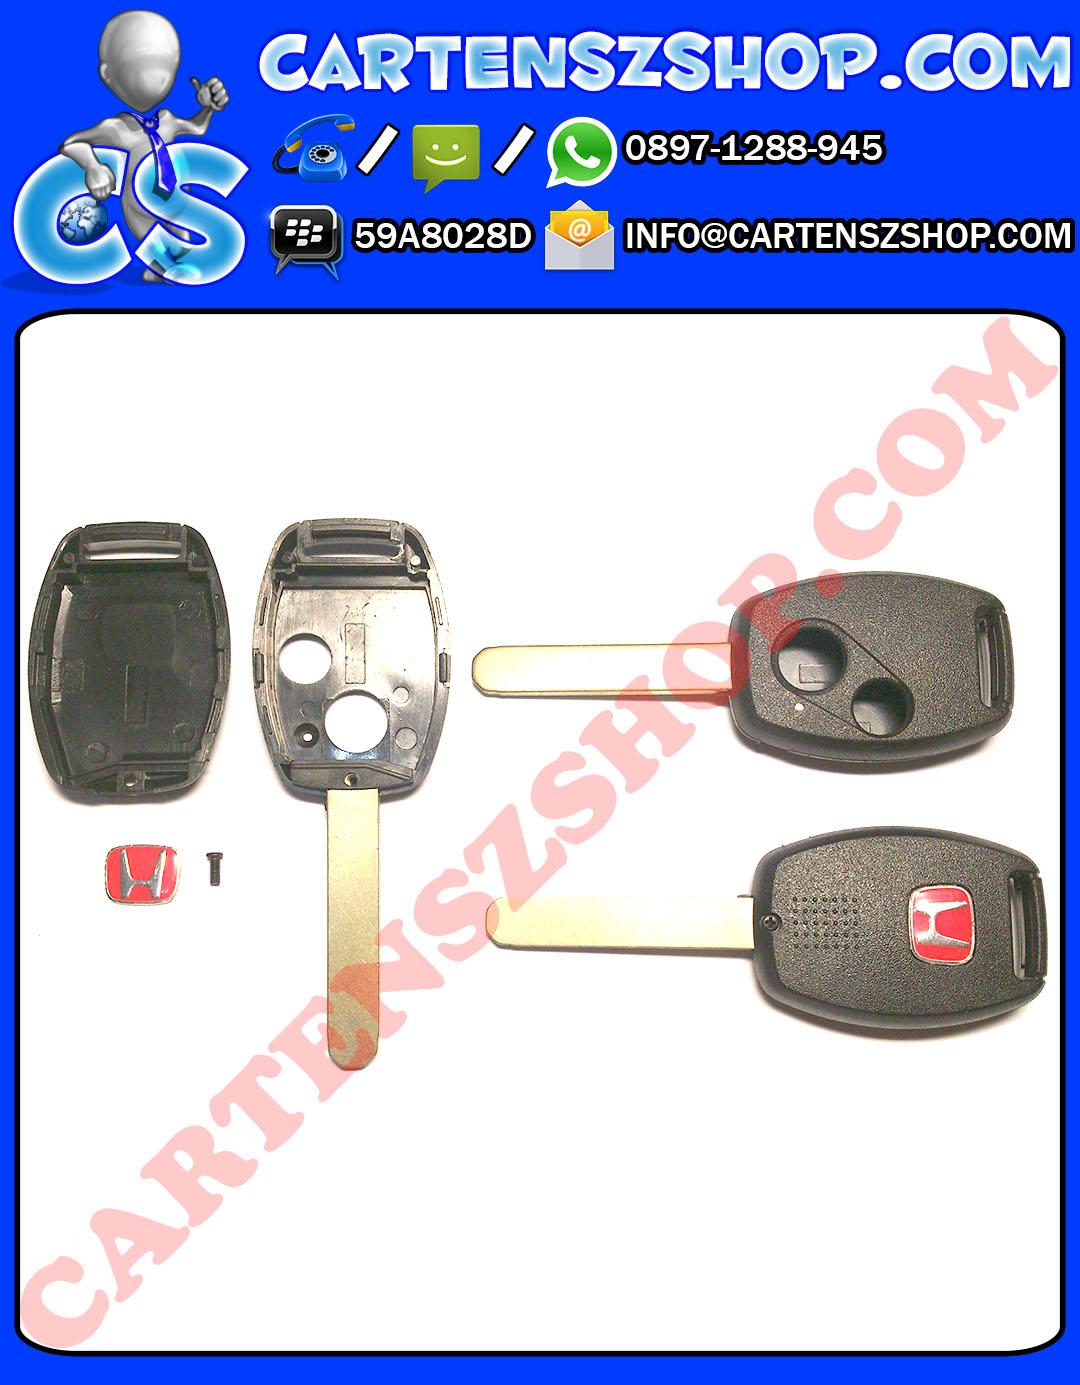 Casing + Emblem Merah Kunci 2 Tombol Honda Mobilio, Brio, Jazz, Dll